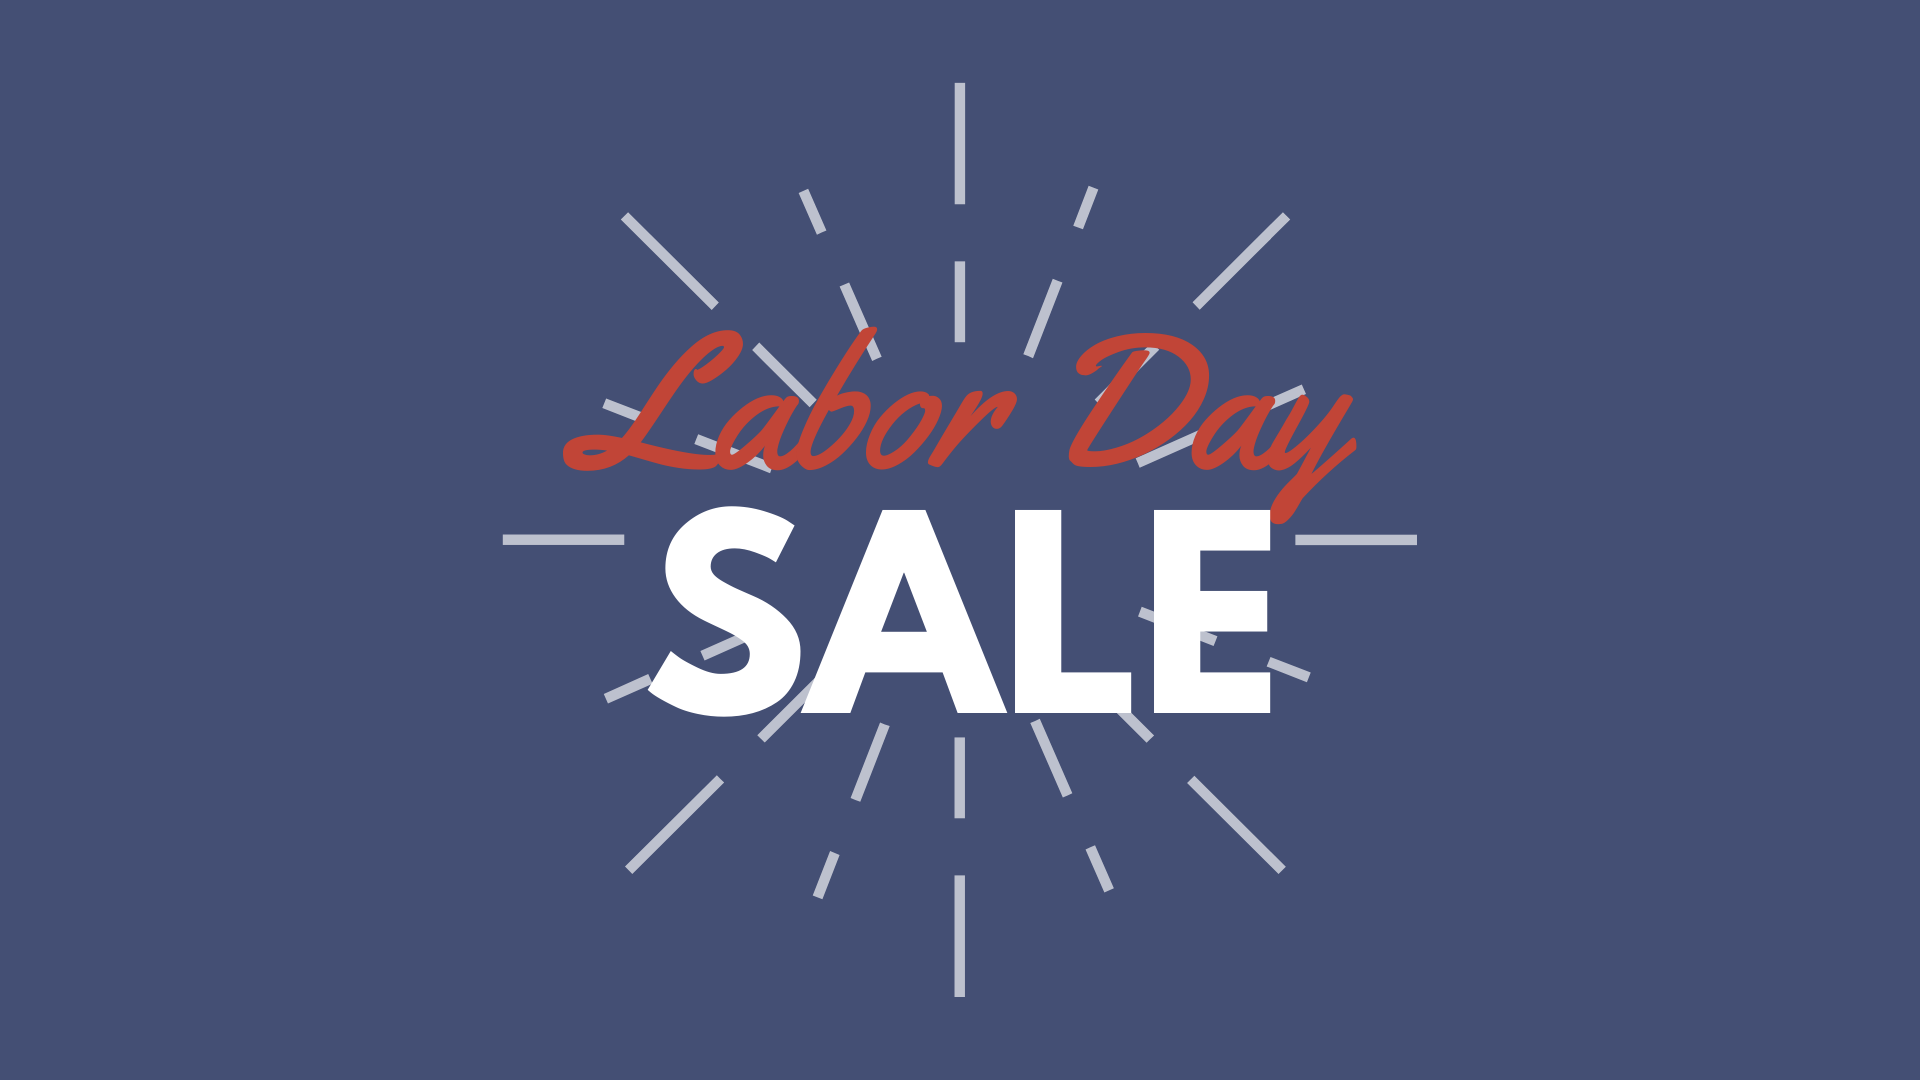 Springbrook Labor Day Pro Shop Sale